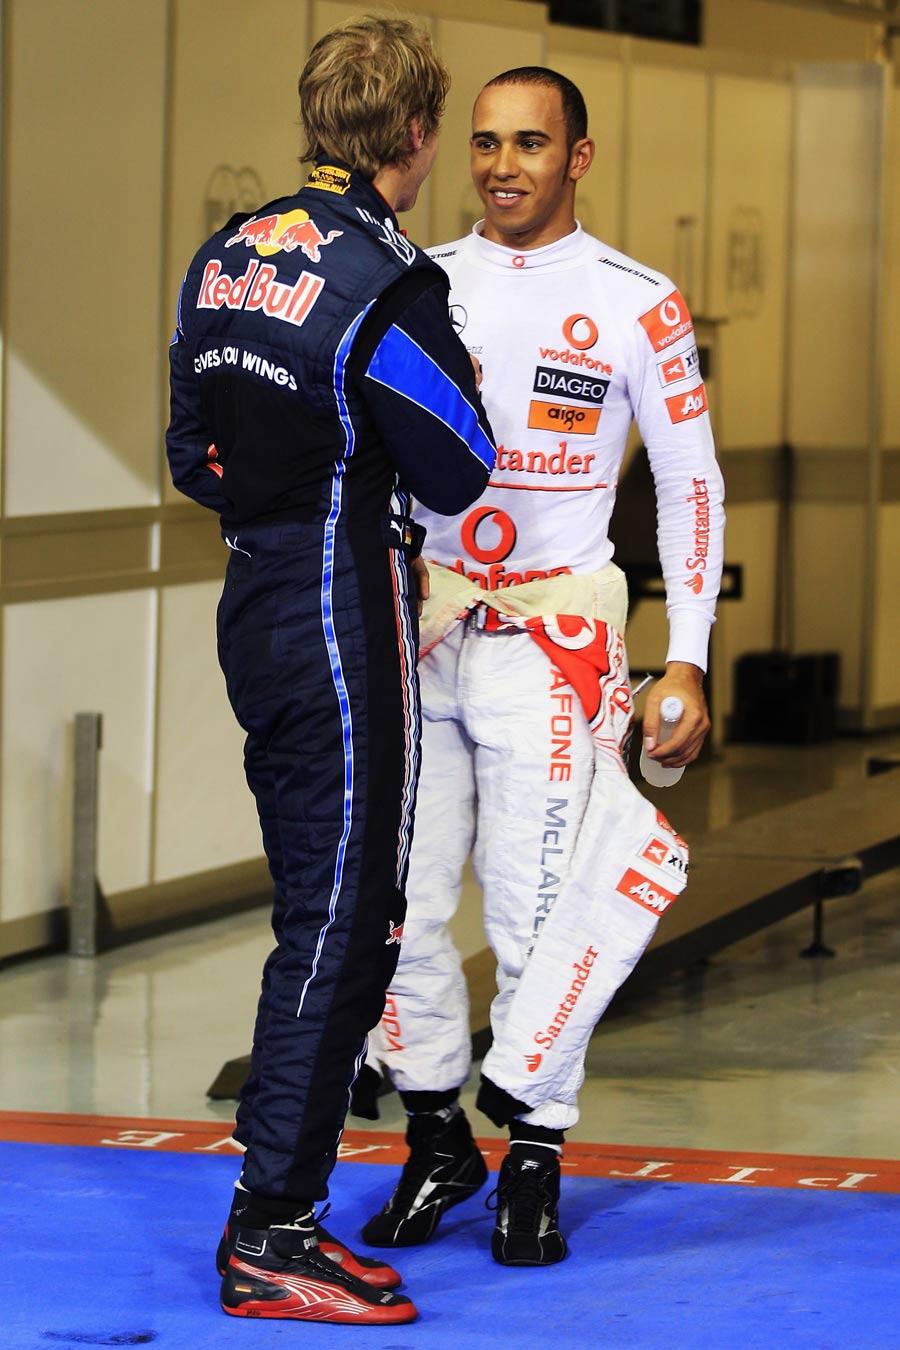 Lewis Hamilton congratulates Sebastian Vettel on his pole position